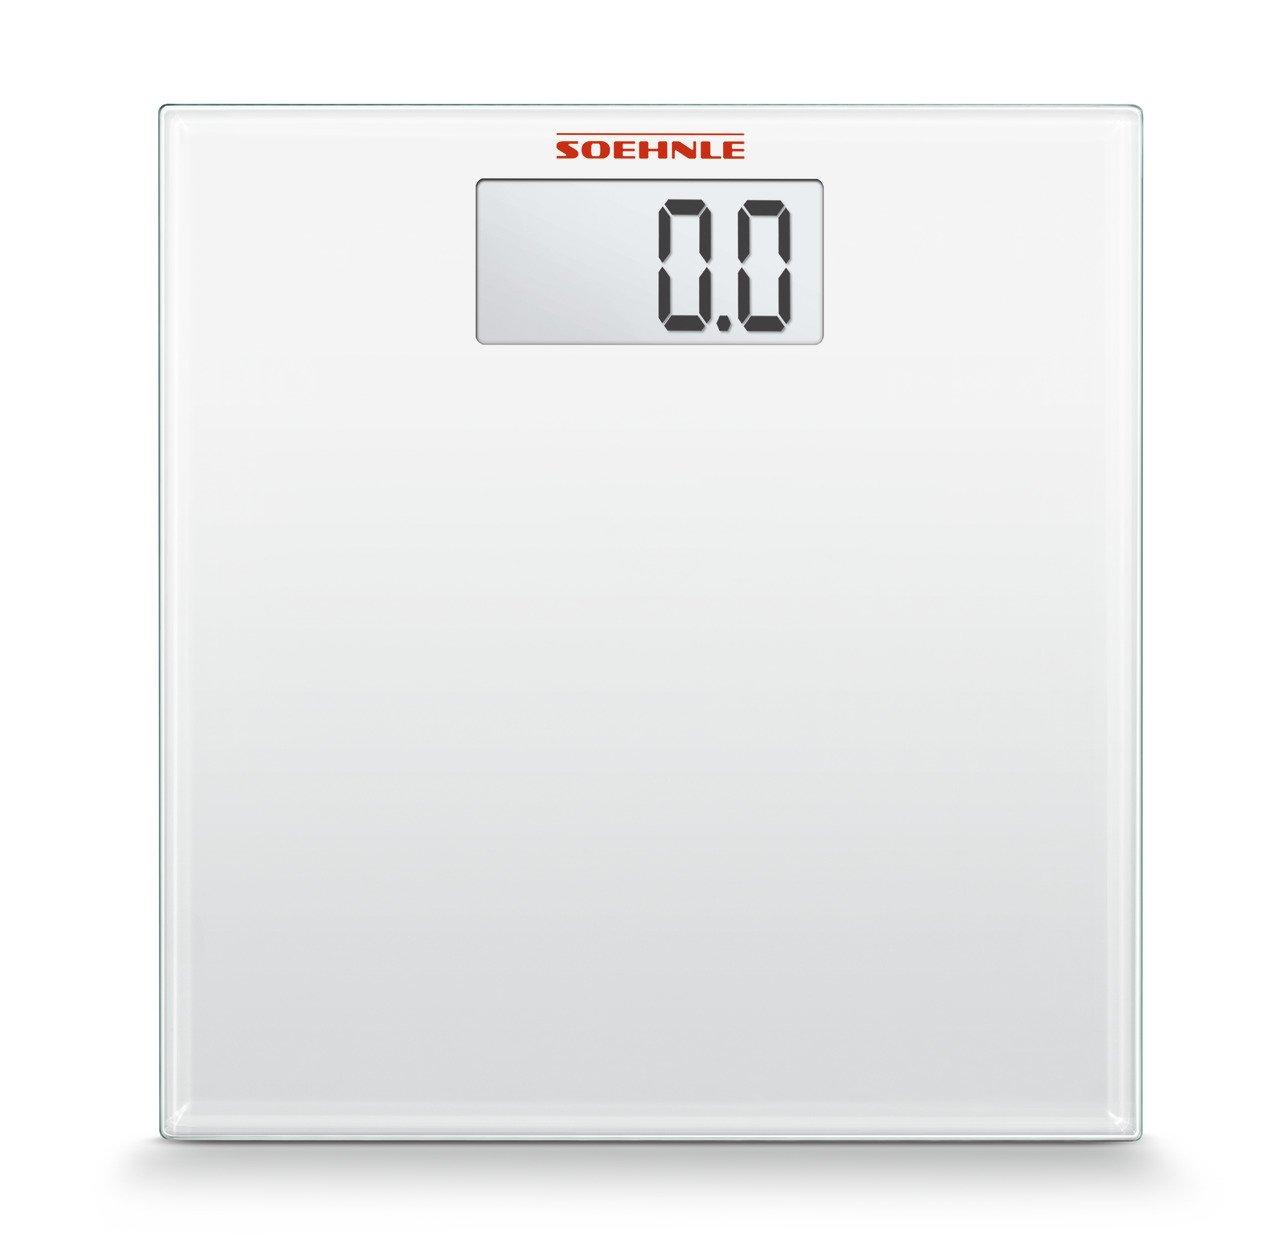 Amazon.com: SOEHNLE 63757 Digital Multi Bathroom Scales, White by Soehnle: Health & Personal Care